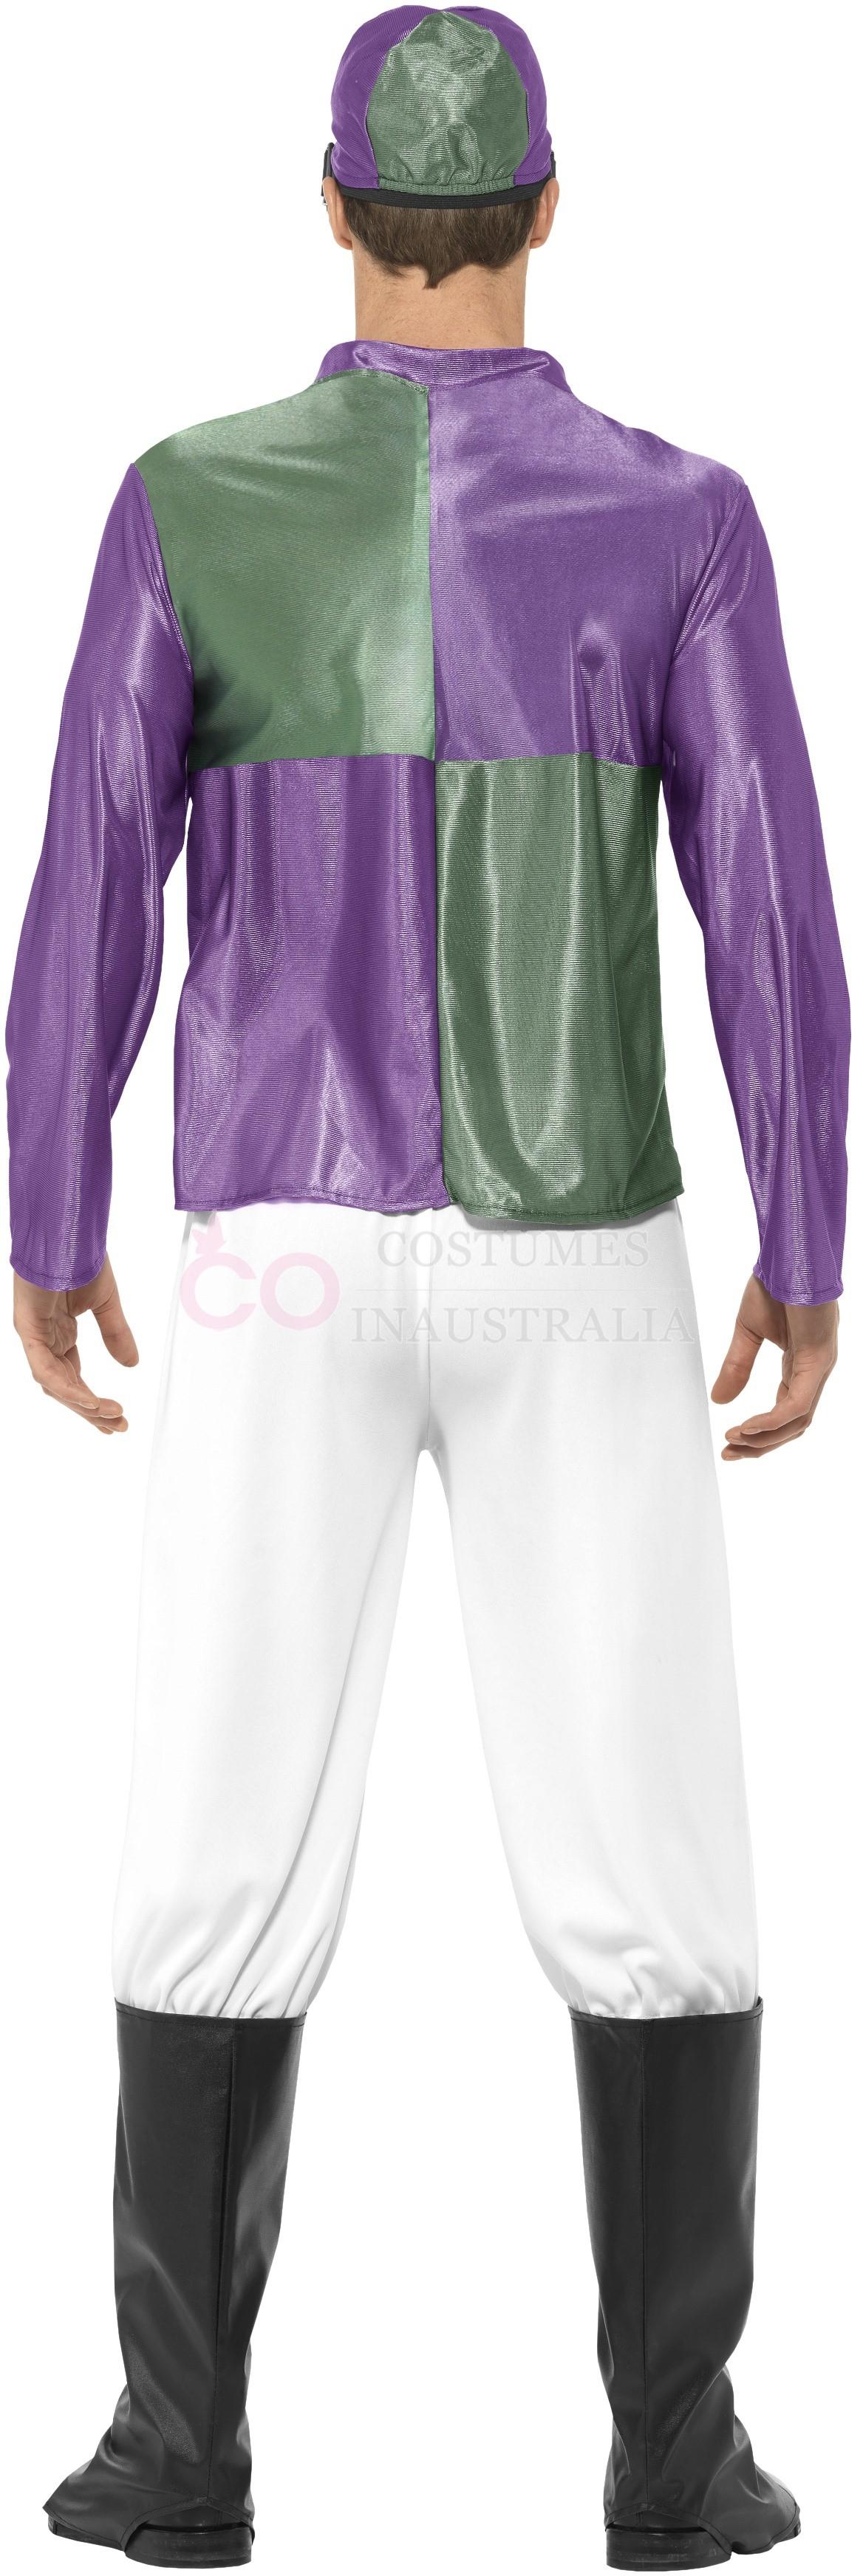 Product. Description. Jockey Costume  sc 1 st  eBay & Mens Purple Jockey Horse Costume Racing Rider Mens Uniform Hat ...